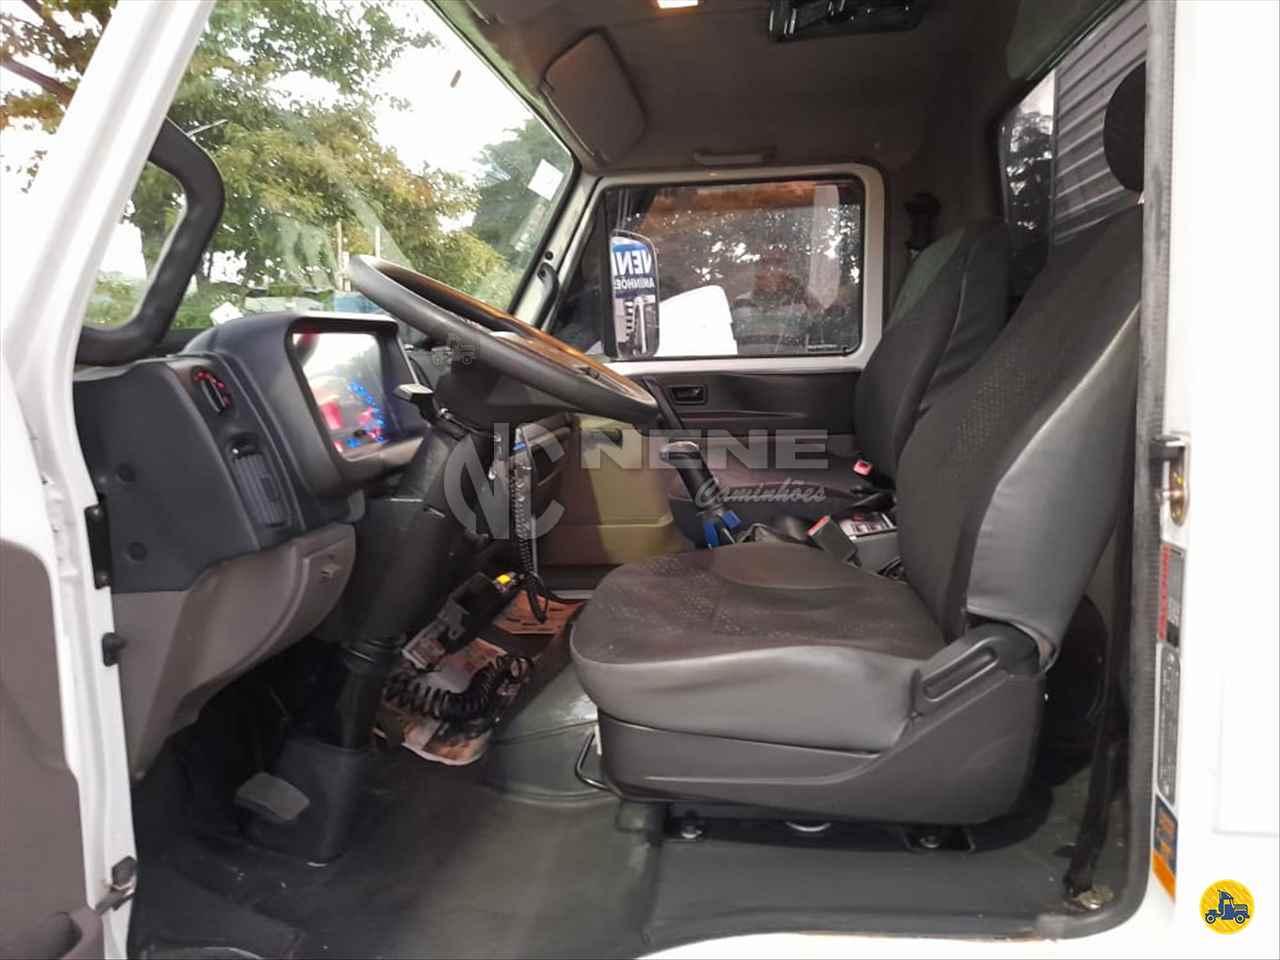 VOLKSWAGEN VW 8160  2016/2017 Nene Caminhões